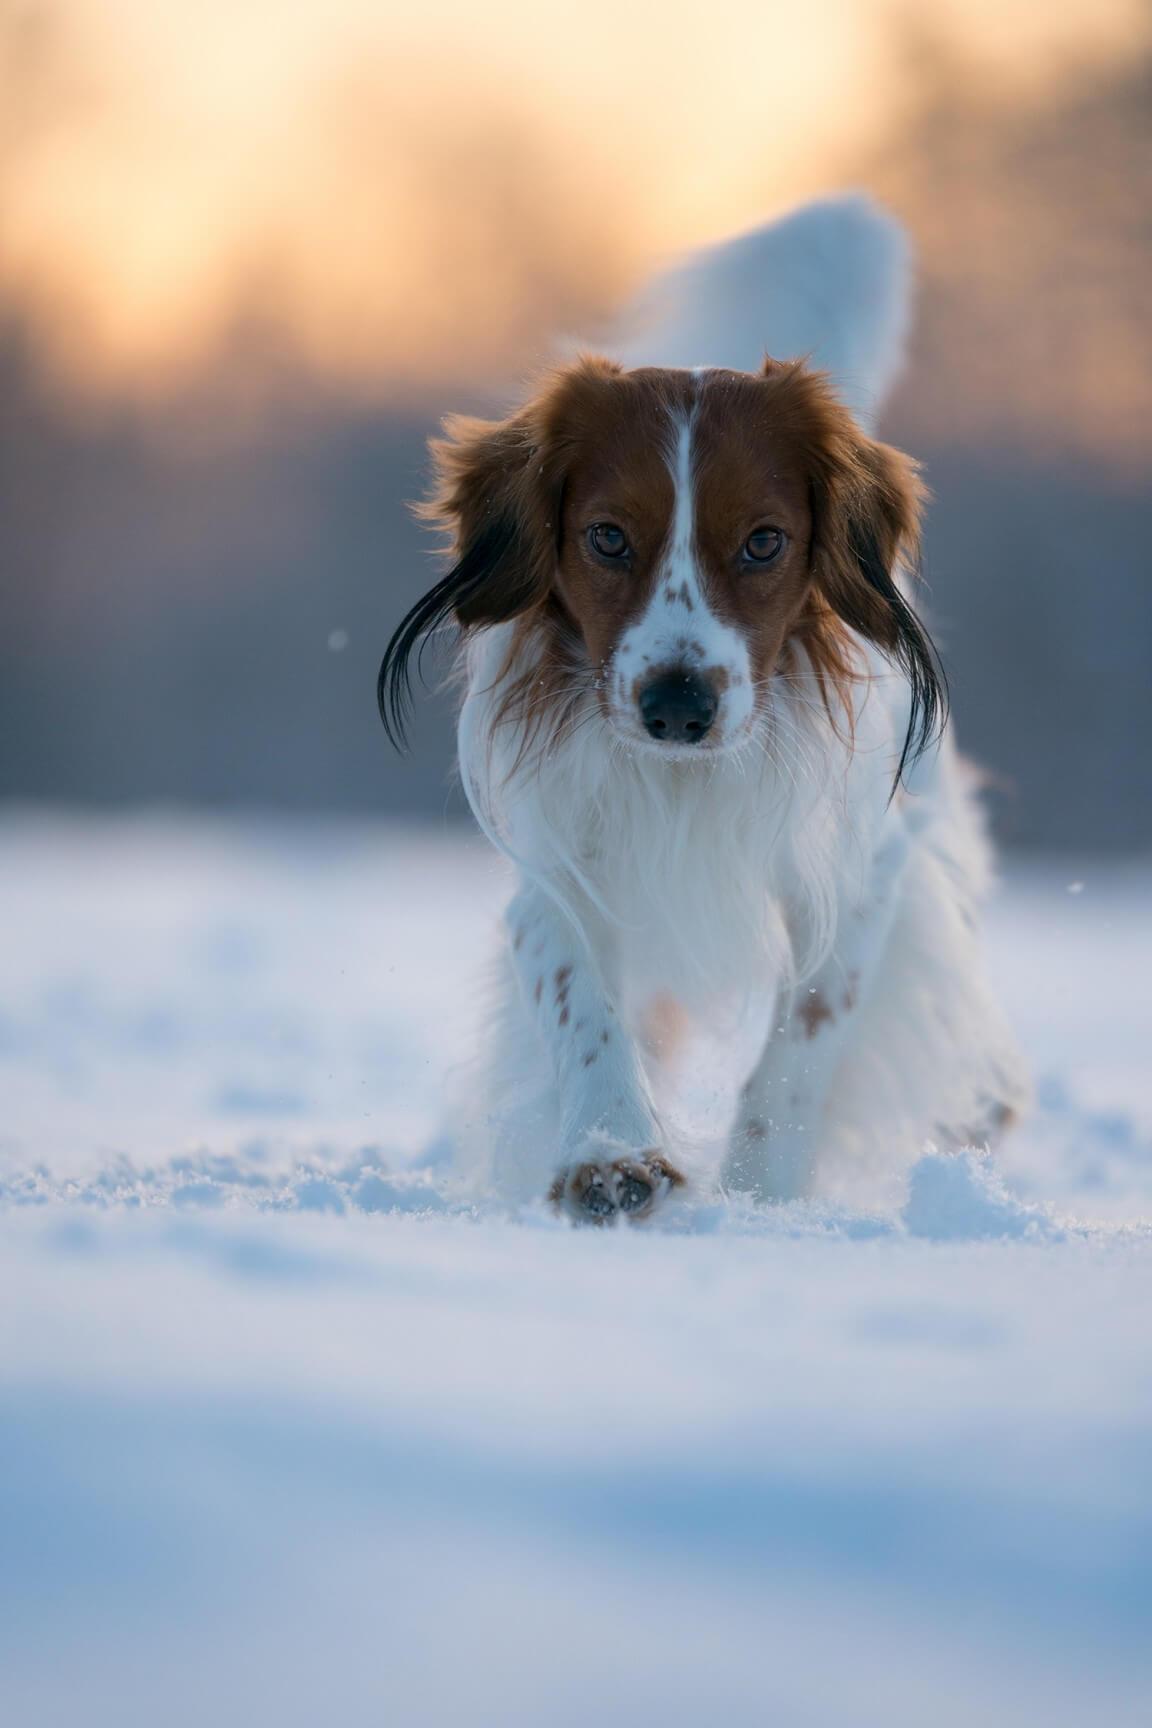 Dog Felix from Wonderland